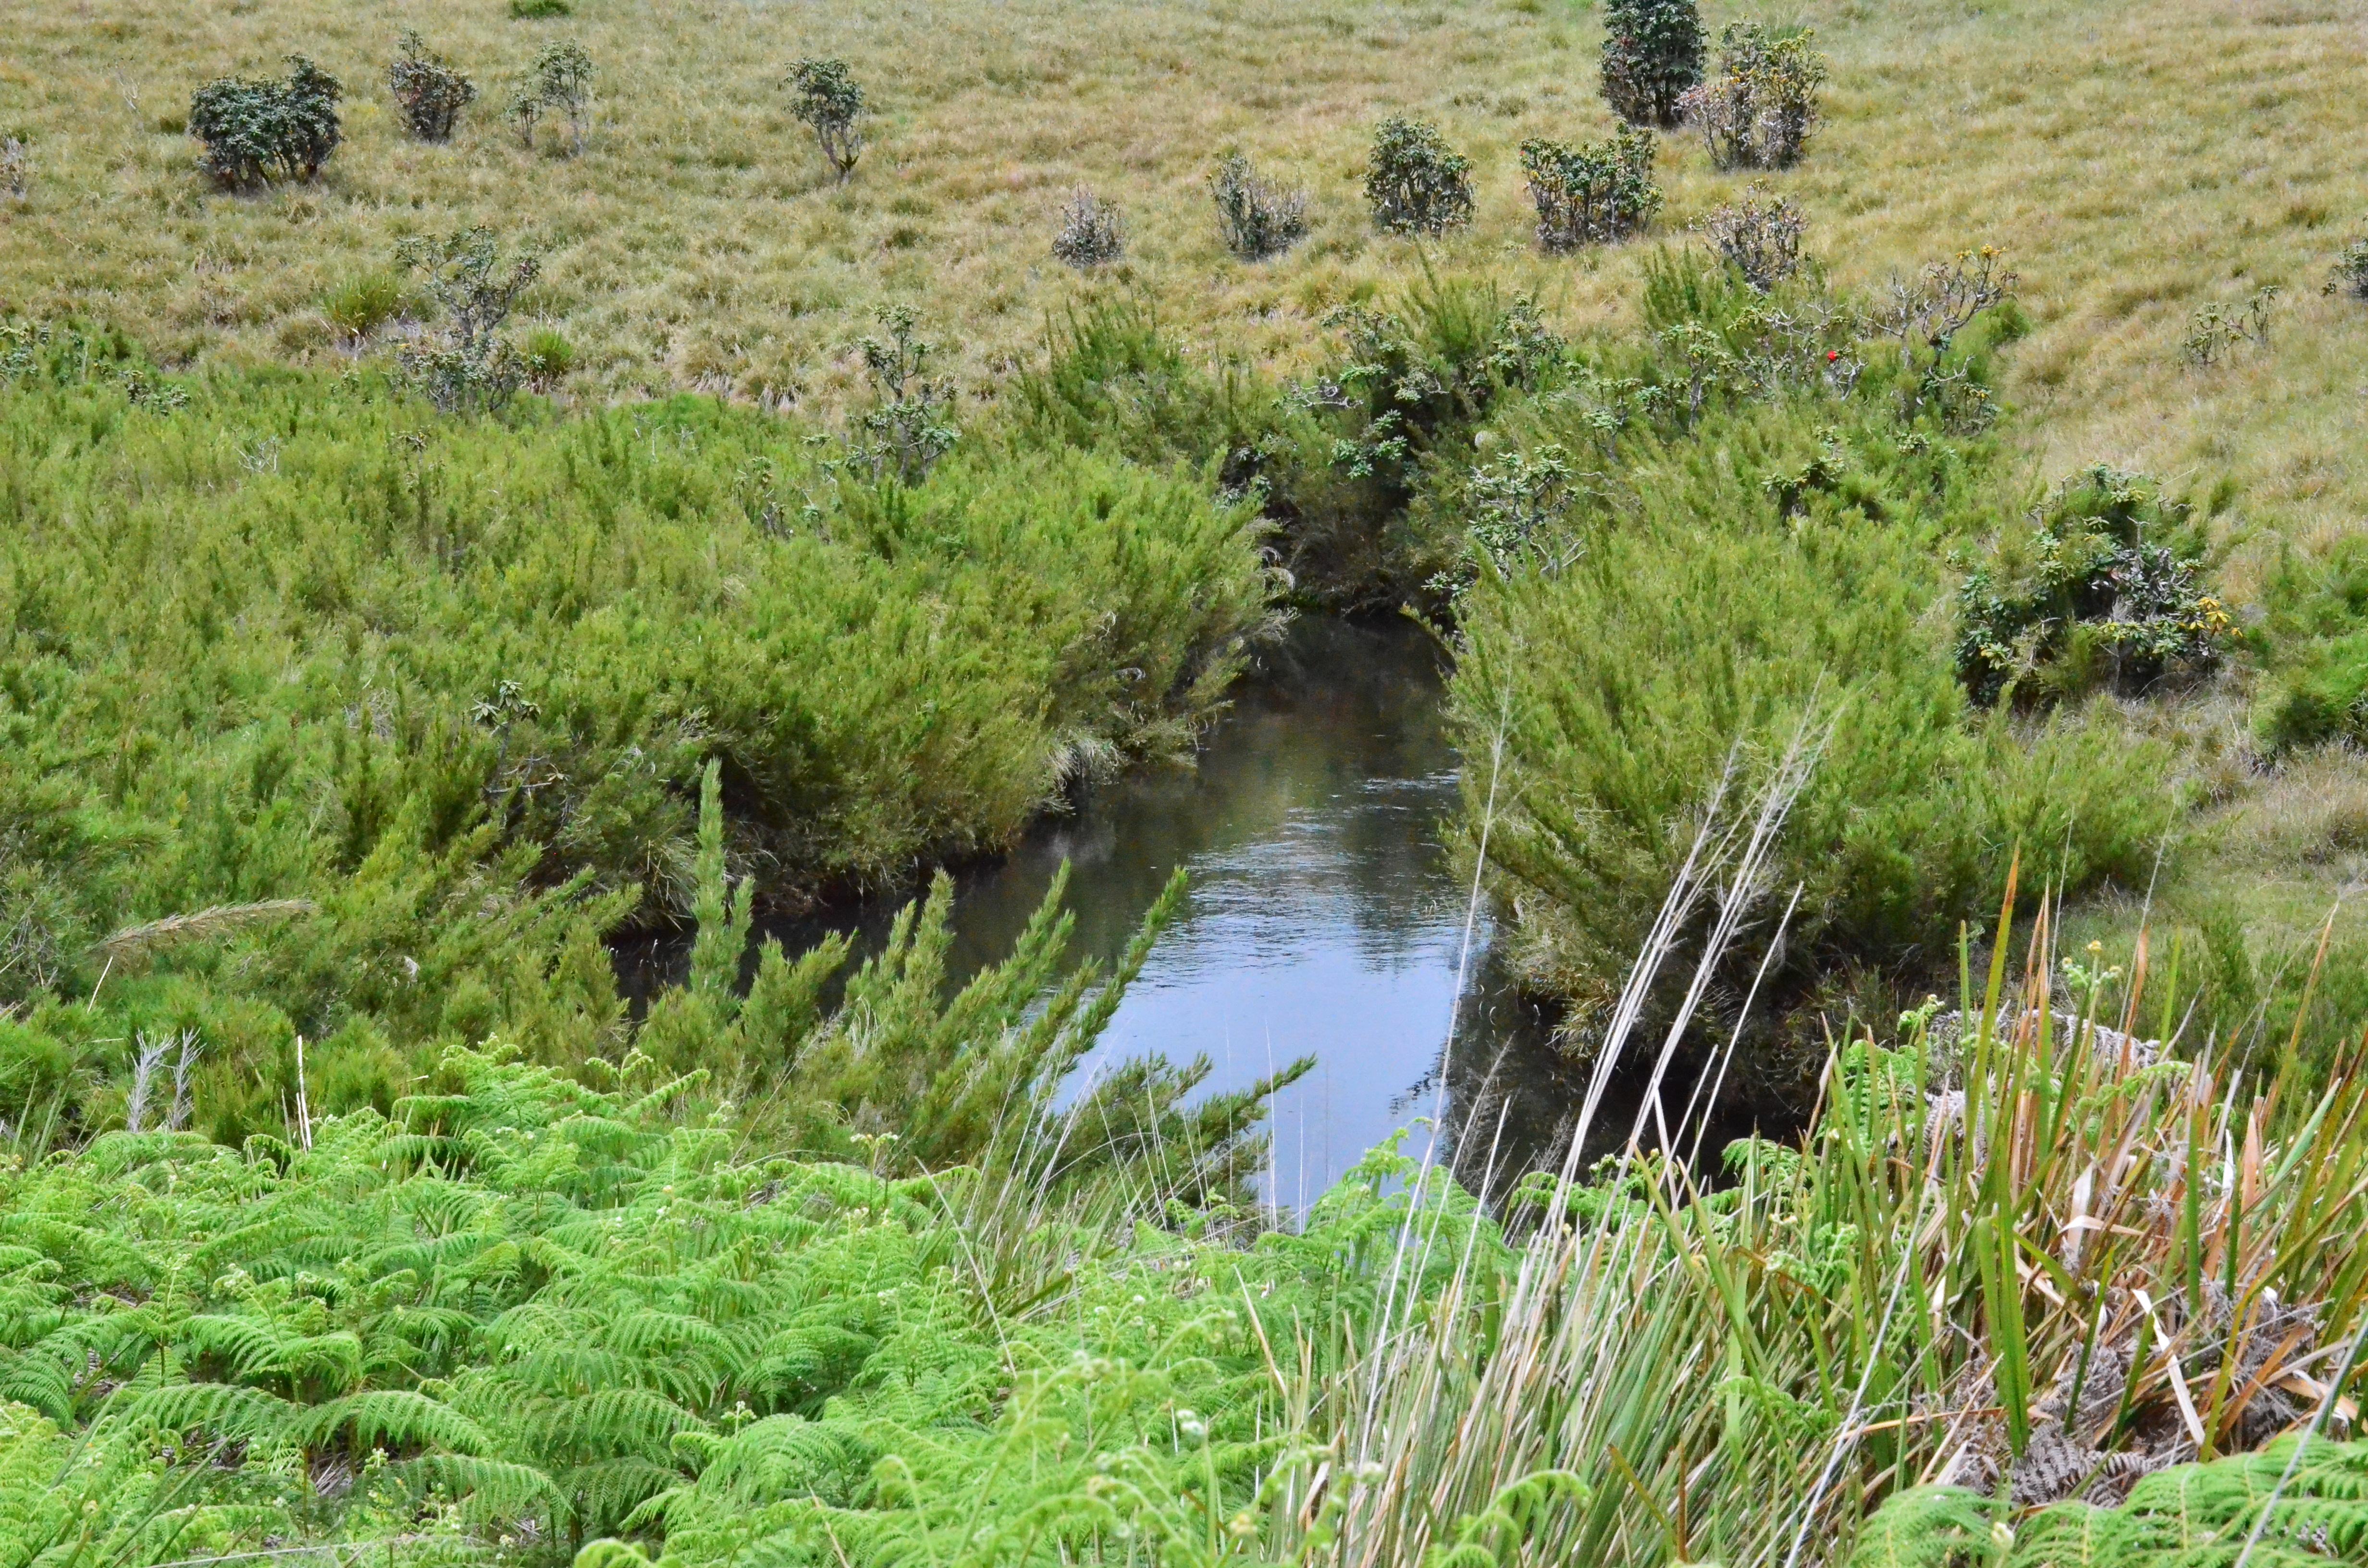 Small_creek_at_Horton_Plains_by_Prarthana_Mahipala.jpg